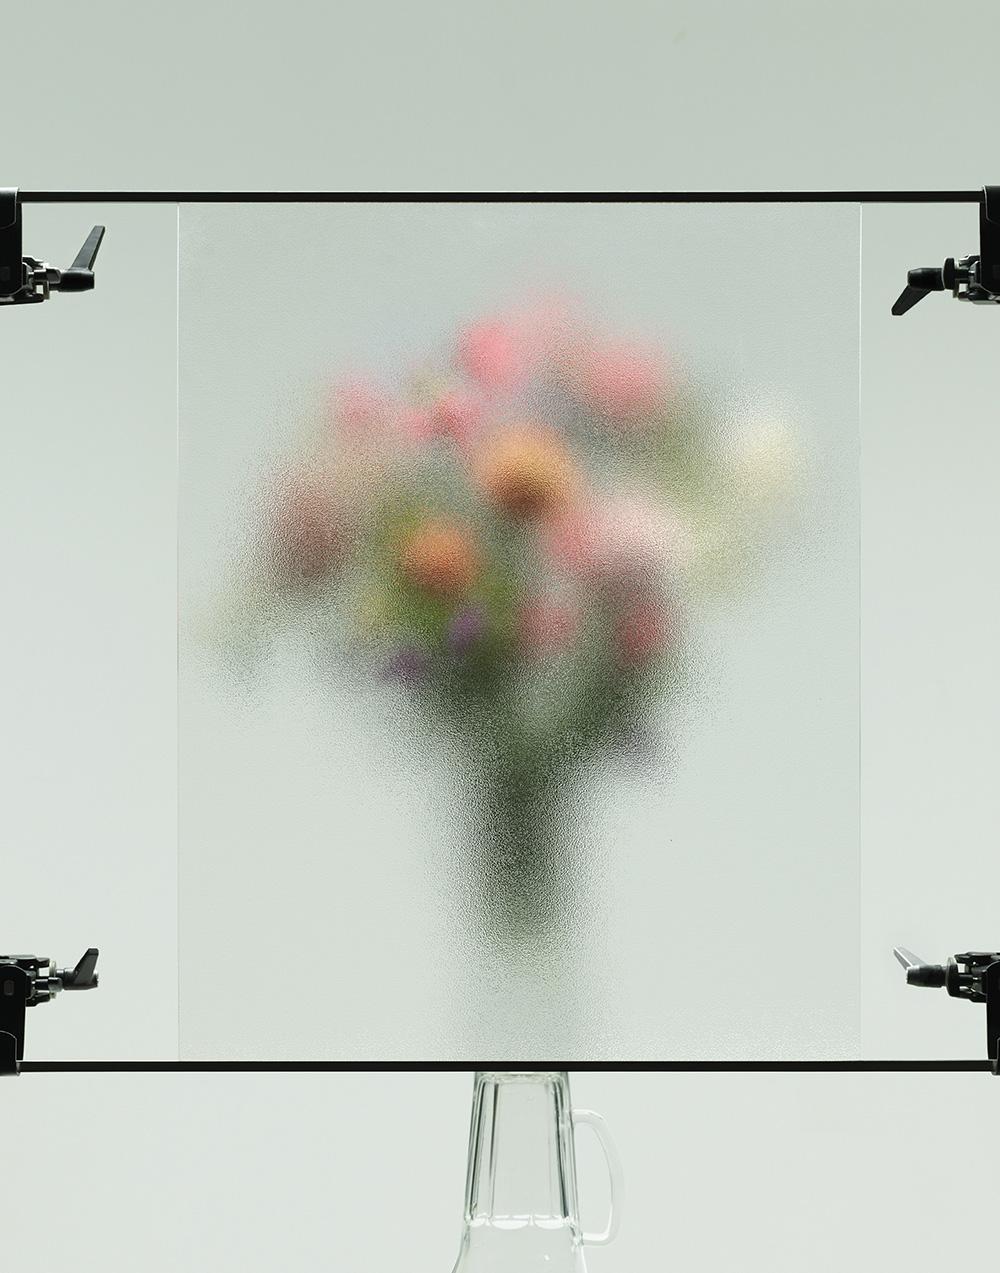 Foggy Flowers x Studio Lernert & Sander